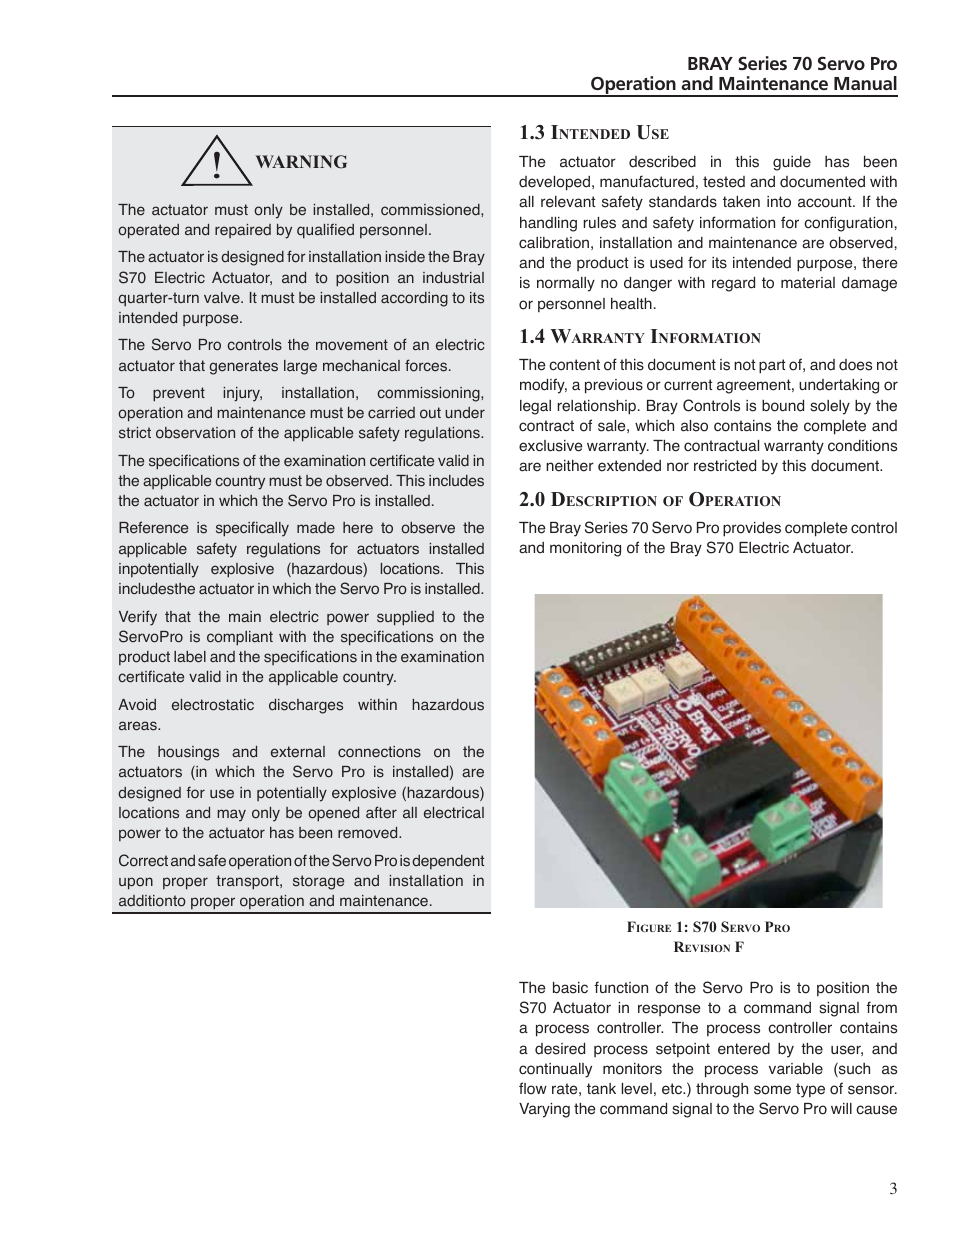 Fine Filtrete Thermostat Wiring Diagram Ensign - Wiring Standart ...